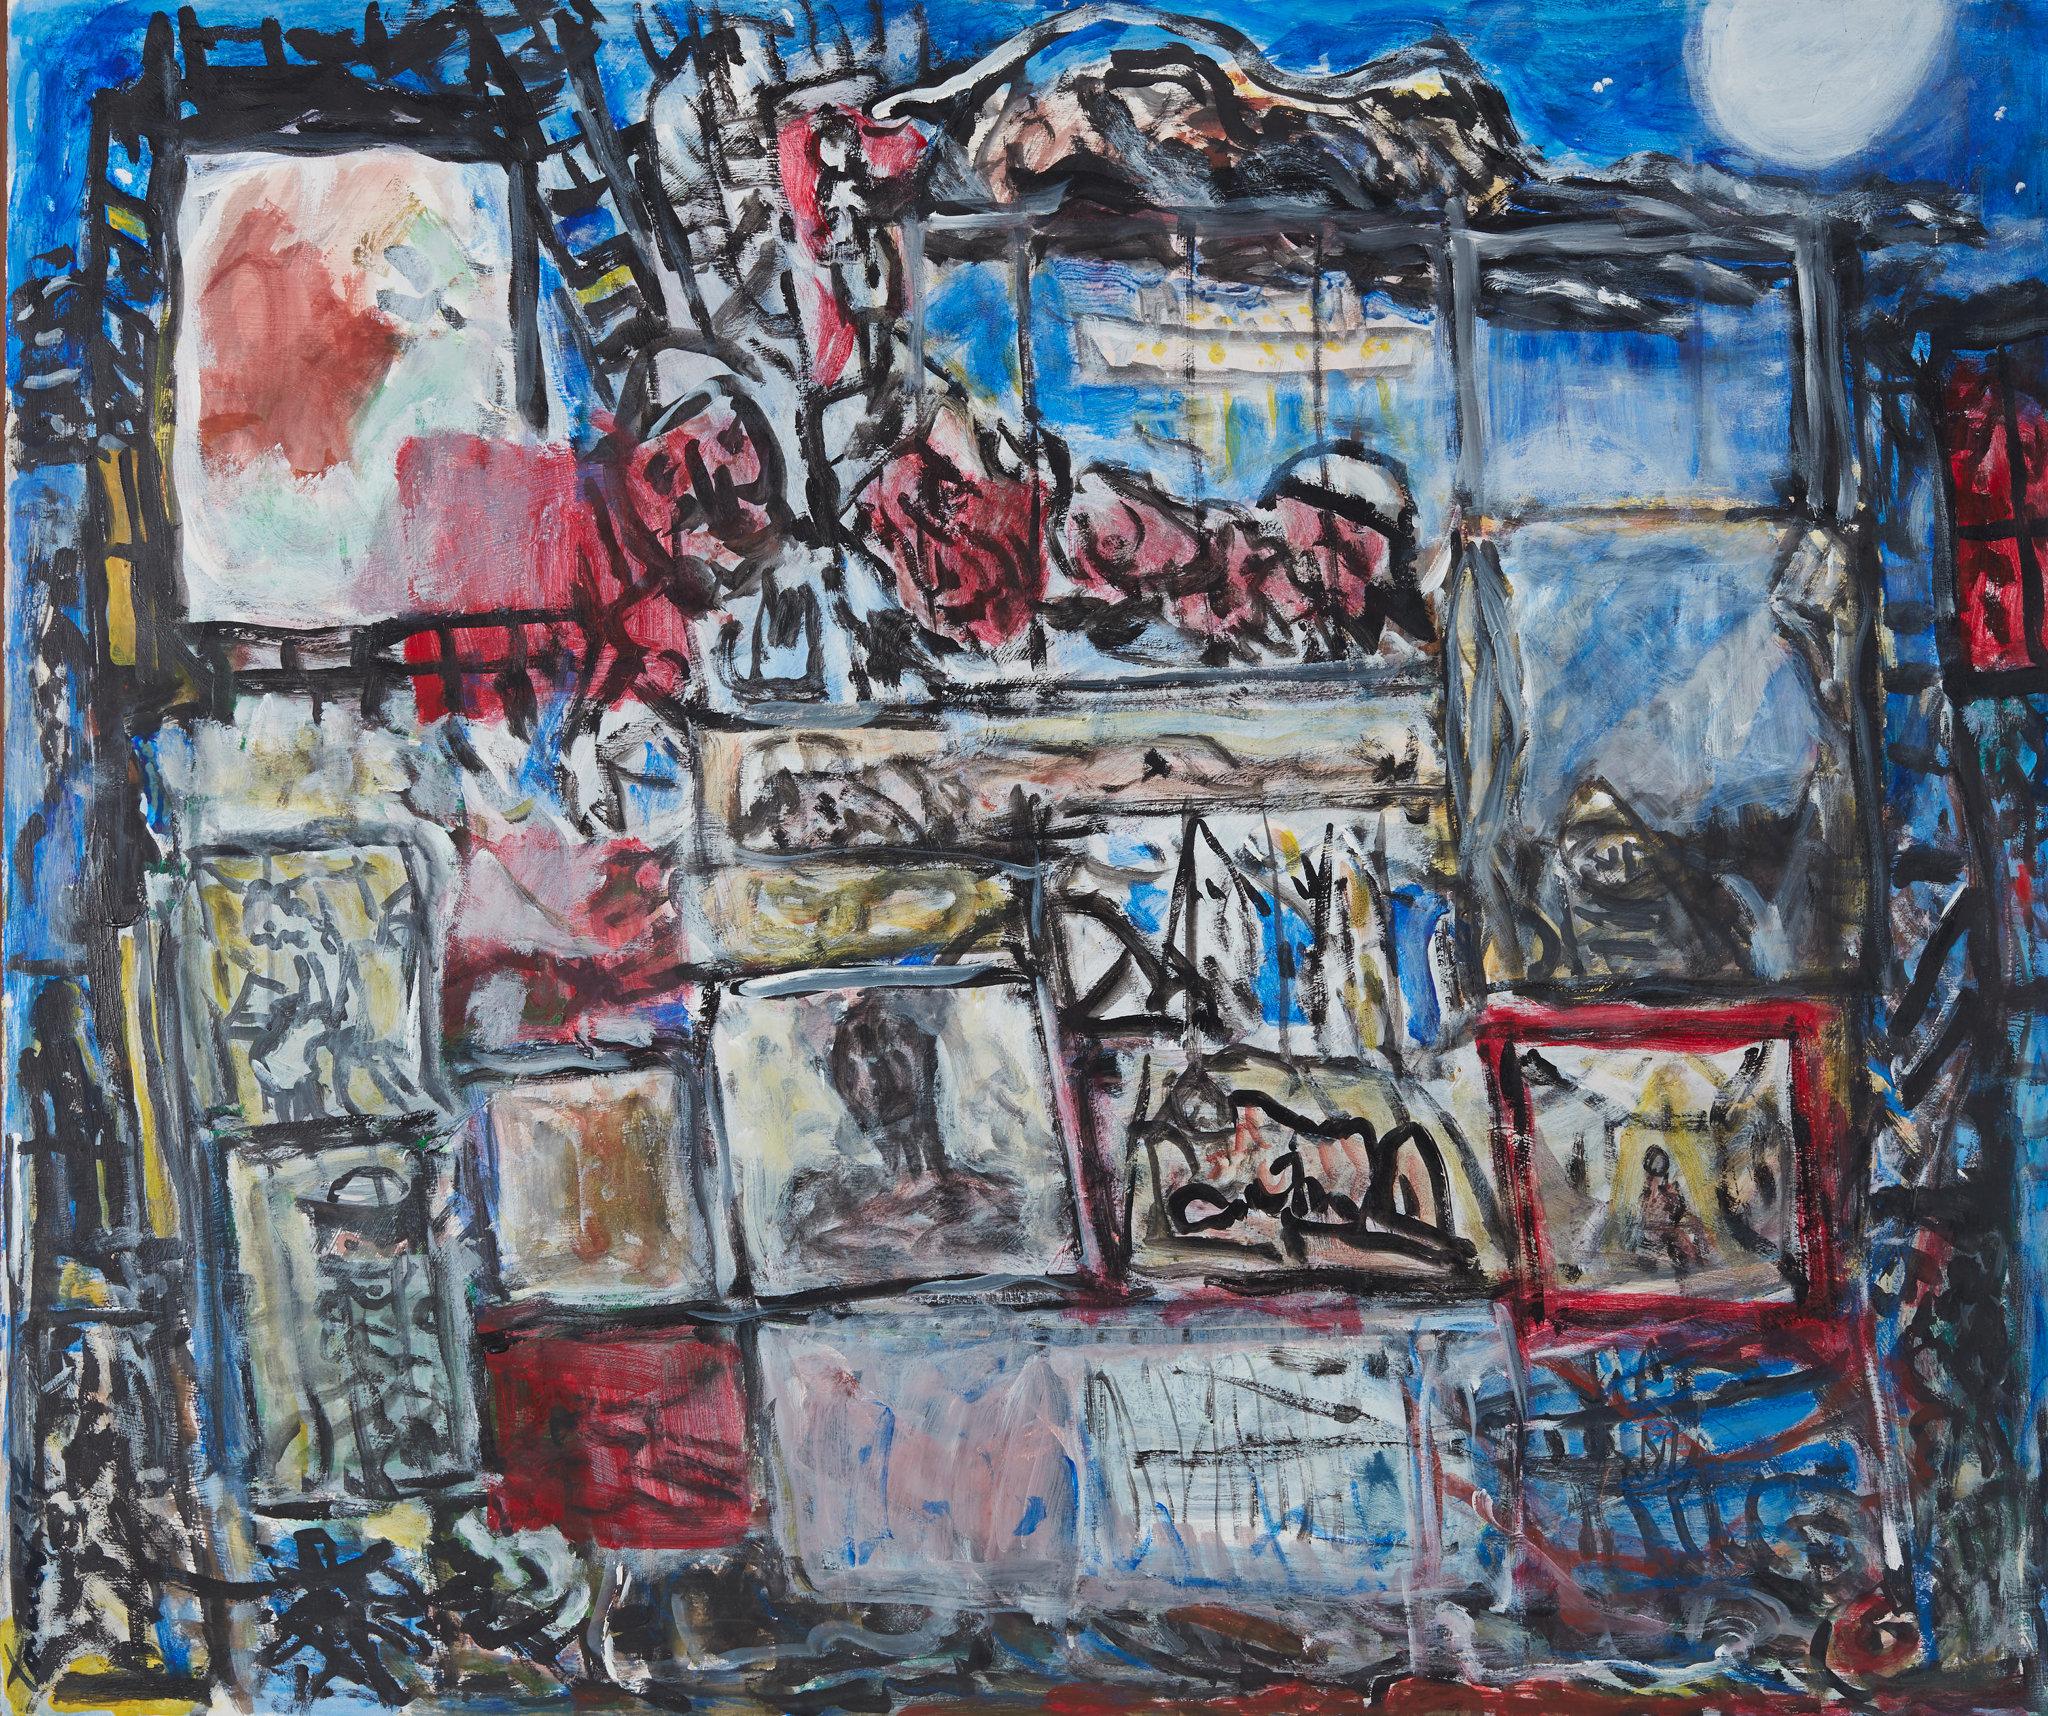 KEVIN CONNOR  The Apartment , 2018 gouache on 300gsm cotton paper 100 x 85 cm